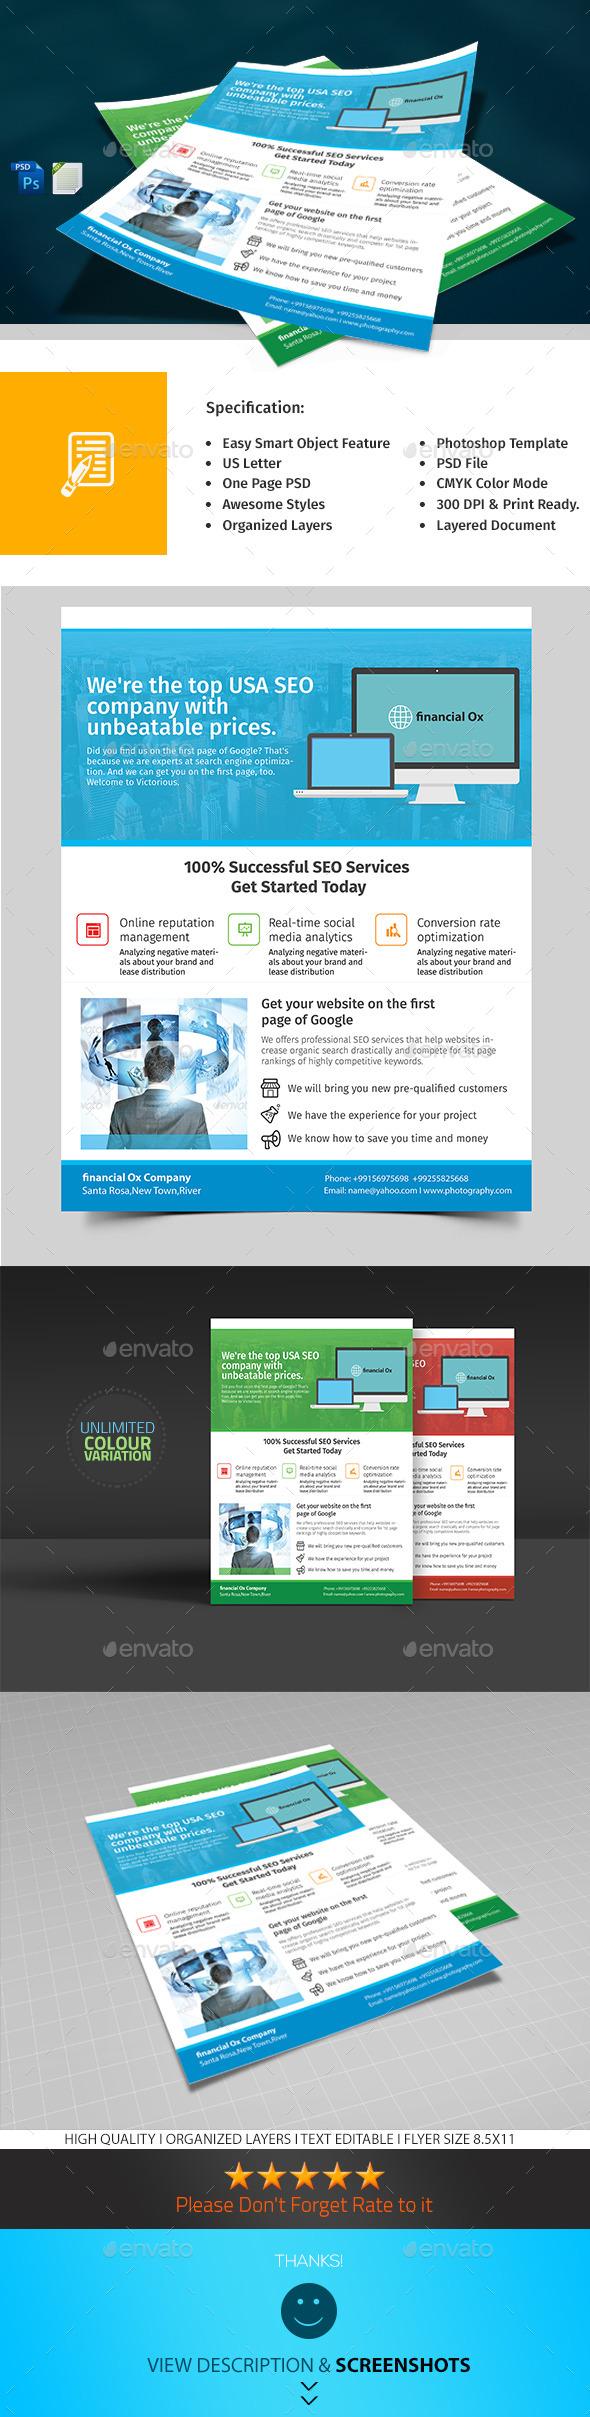 GraphicRiver SEO Marketing Flyer 9949861